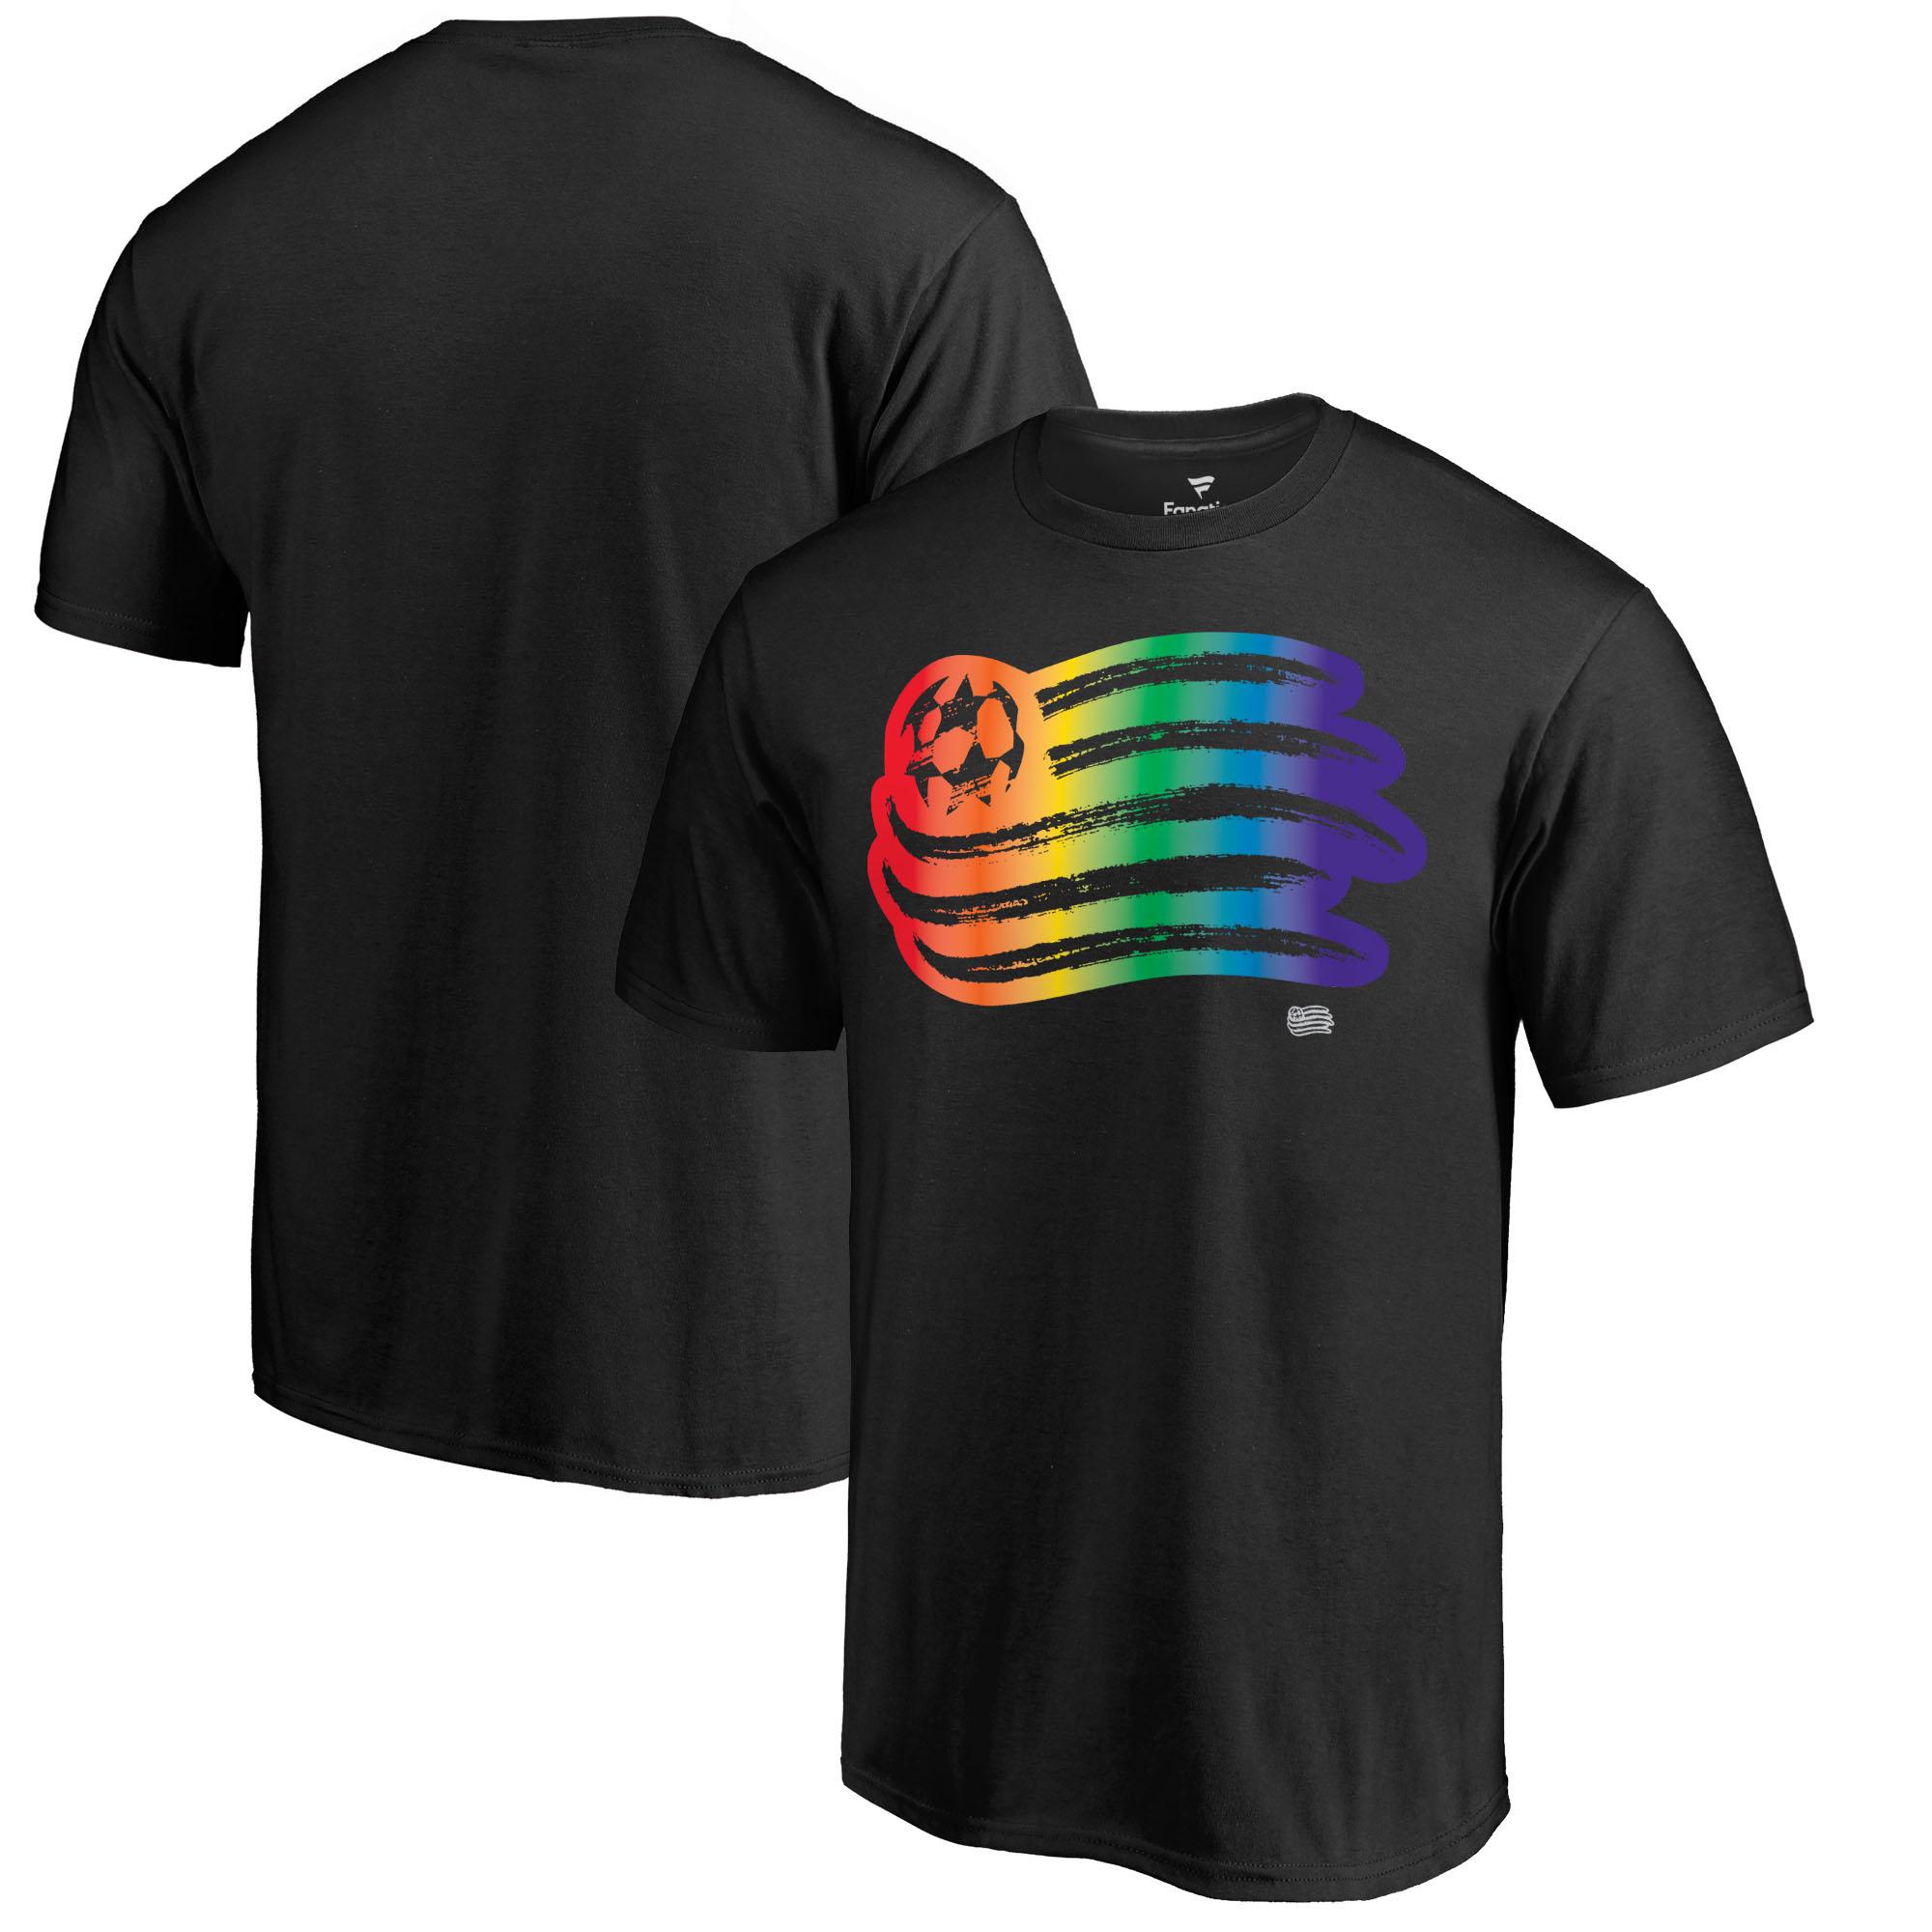 New England Revolution Fanatics Branded Team Pride T-Shirt - Black